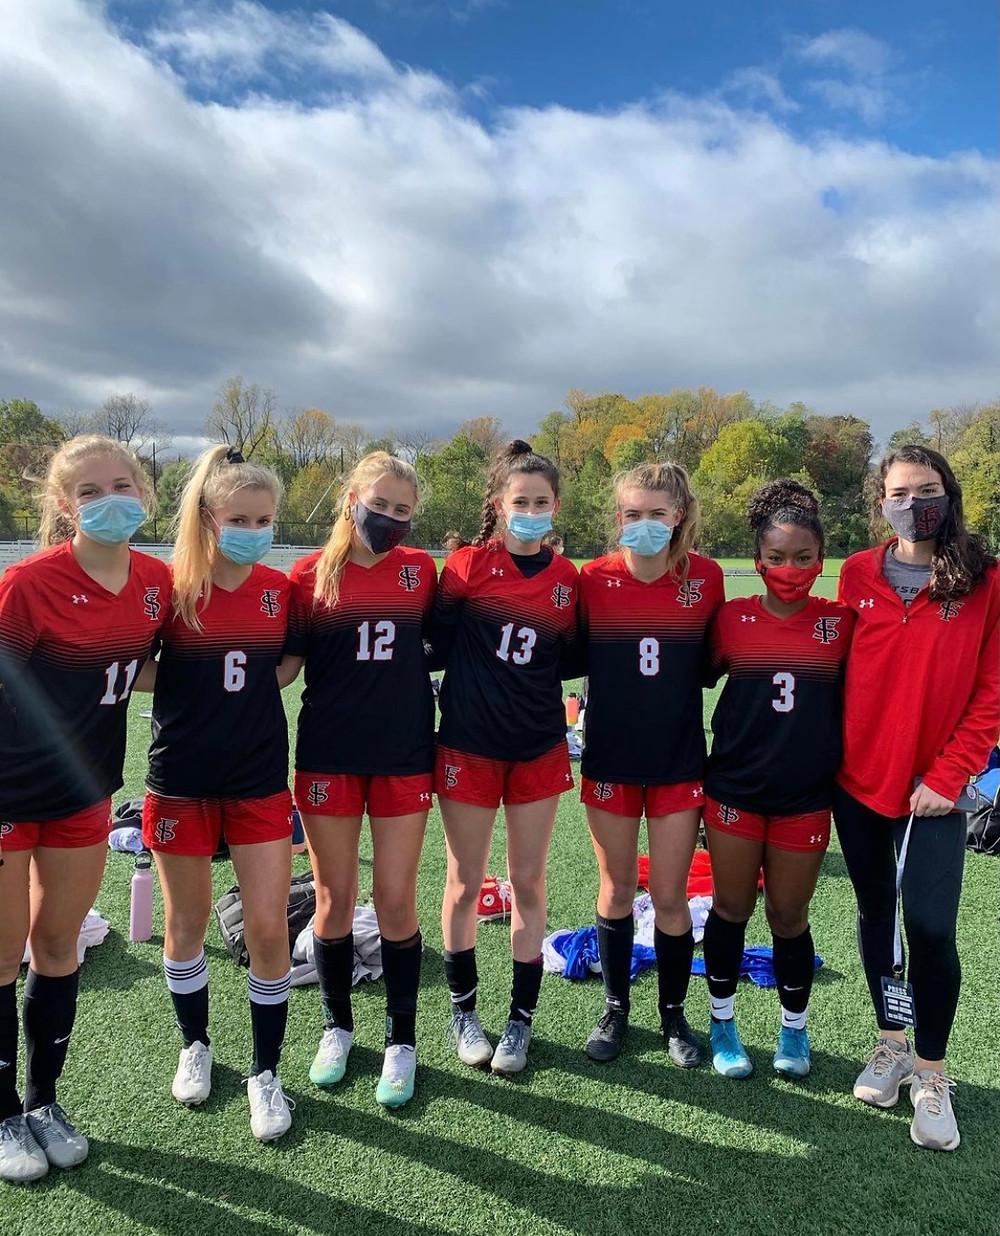 Senior Girls' Varsity Soccer players post-win in October 2020